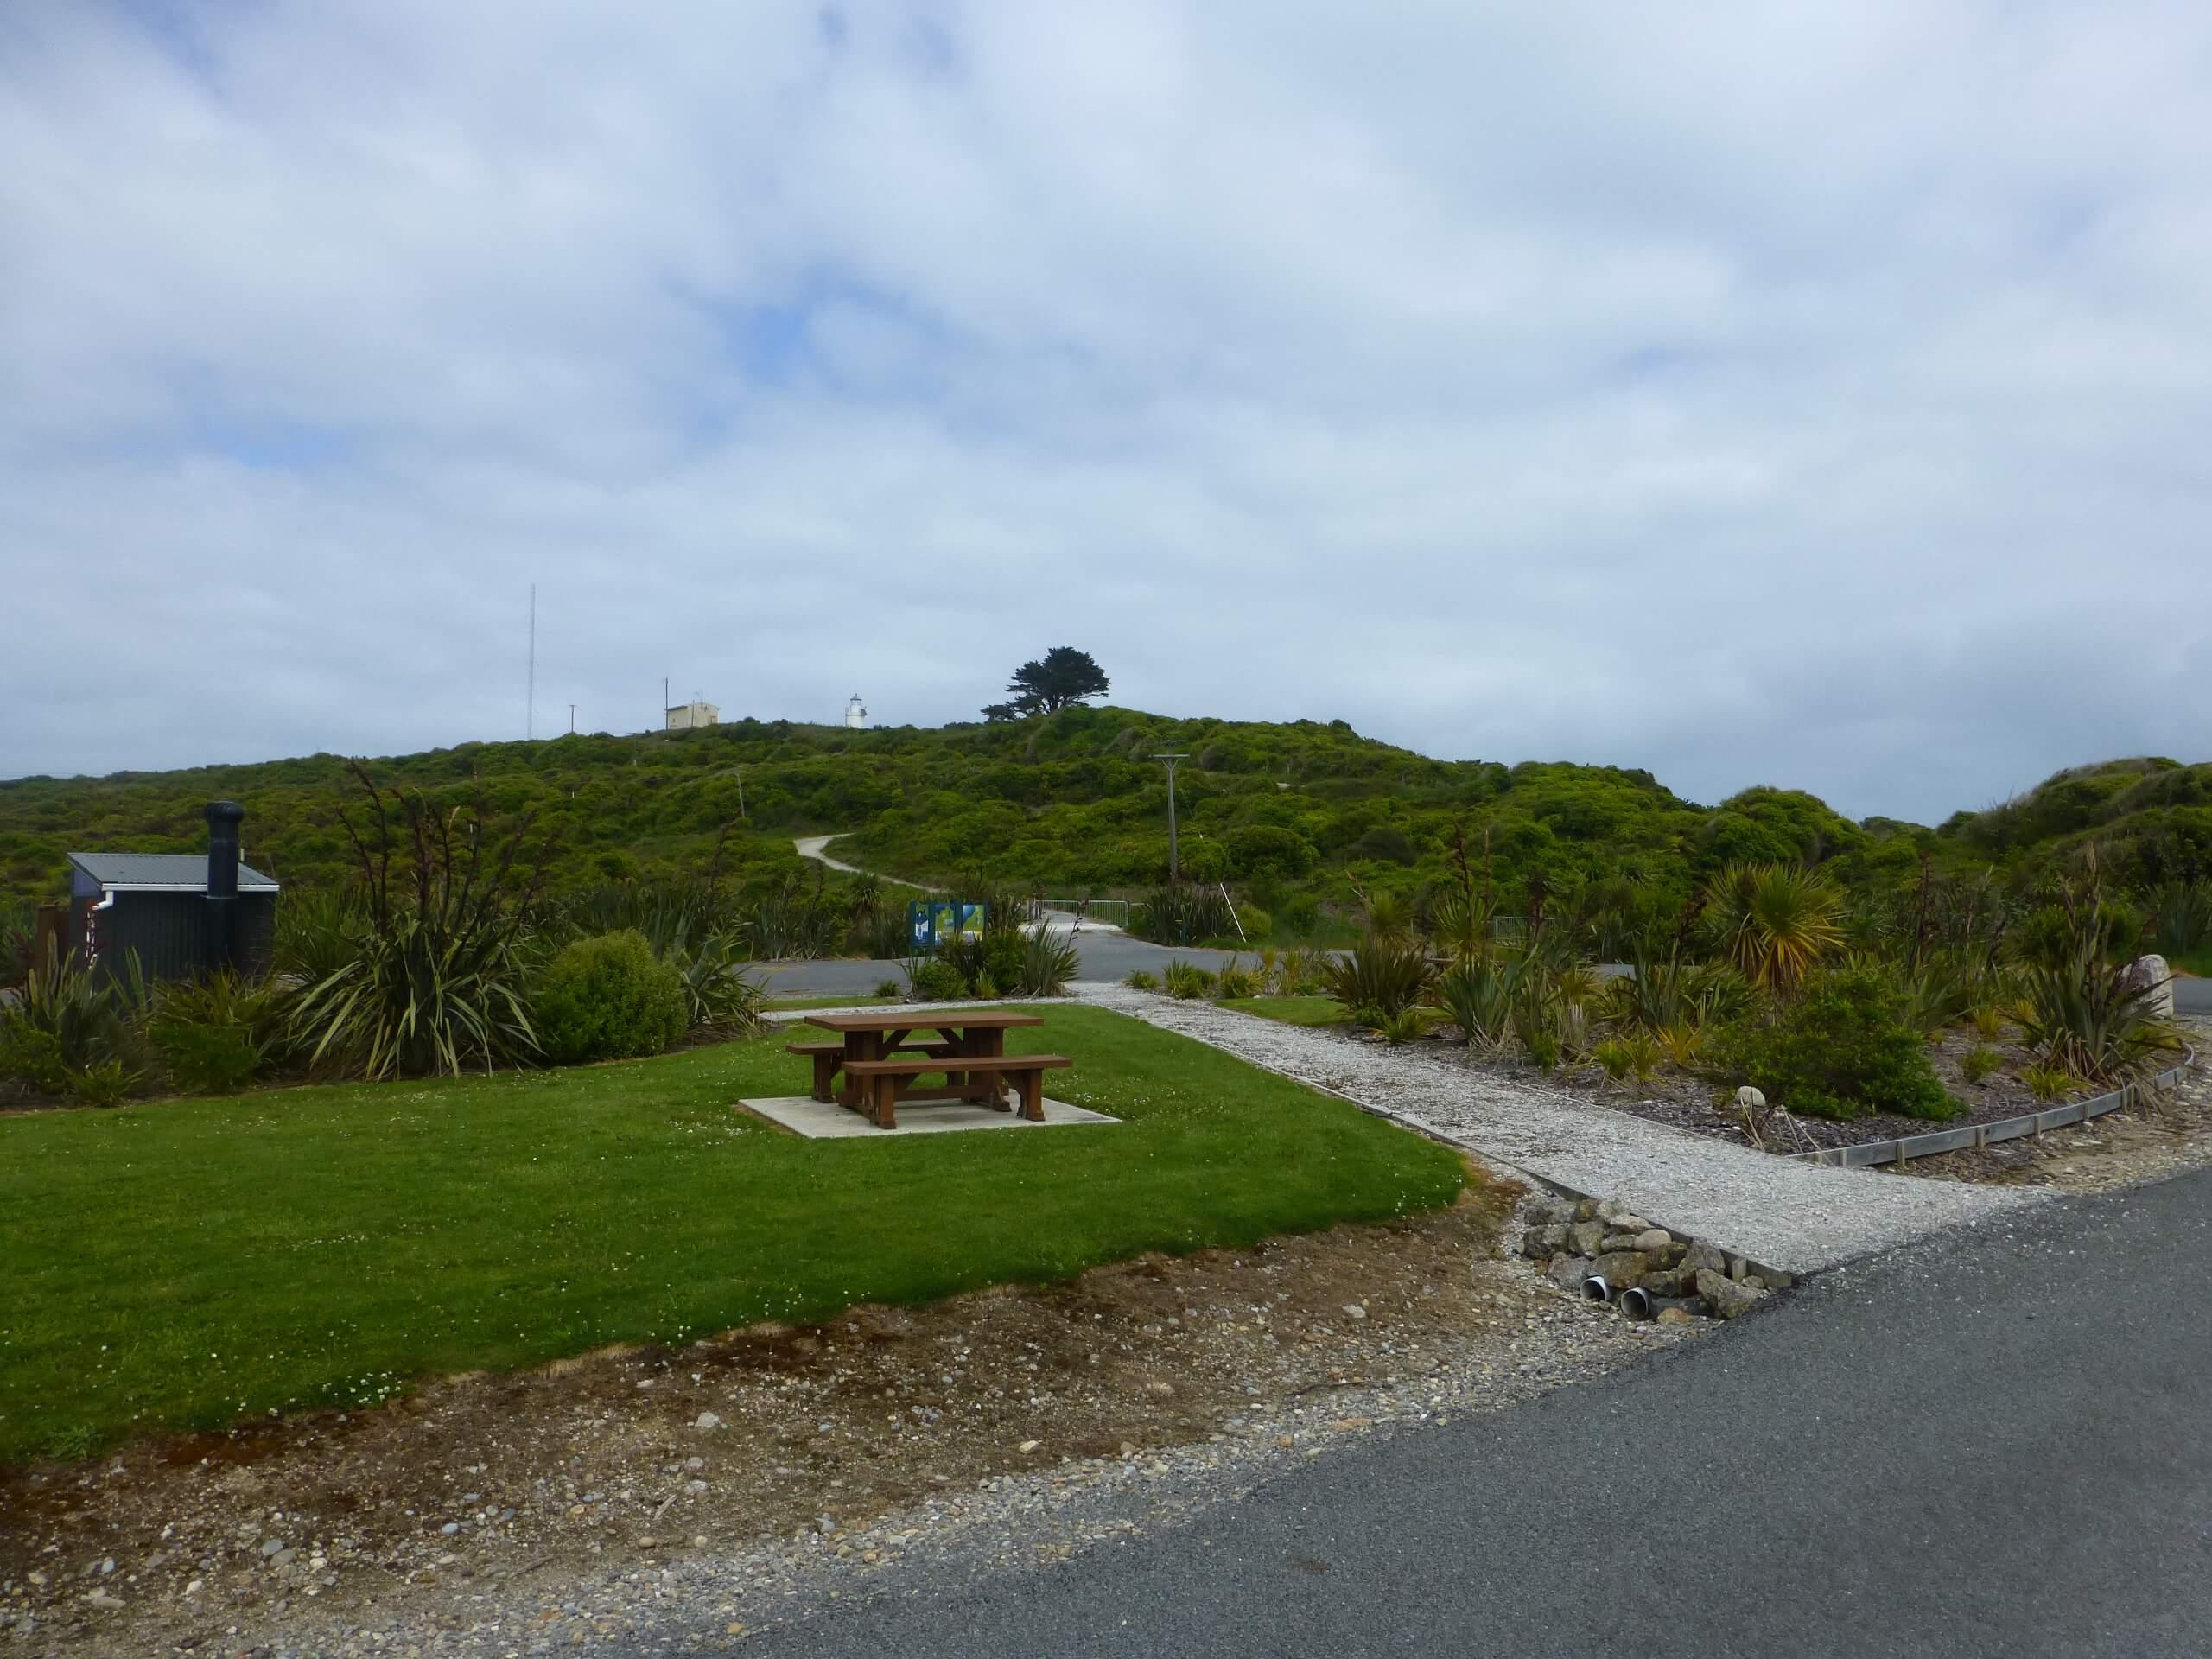 Cape Foulwind, NZ, Westküste 1